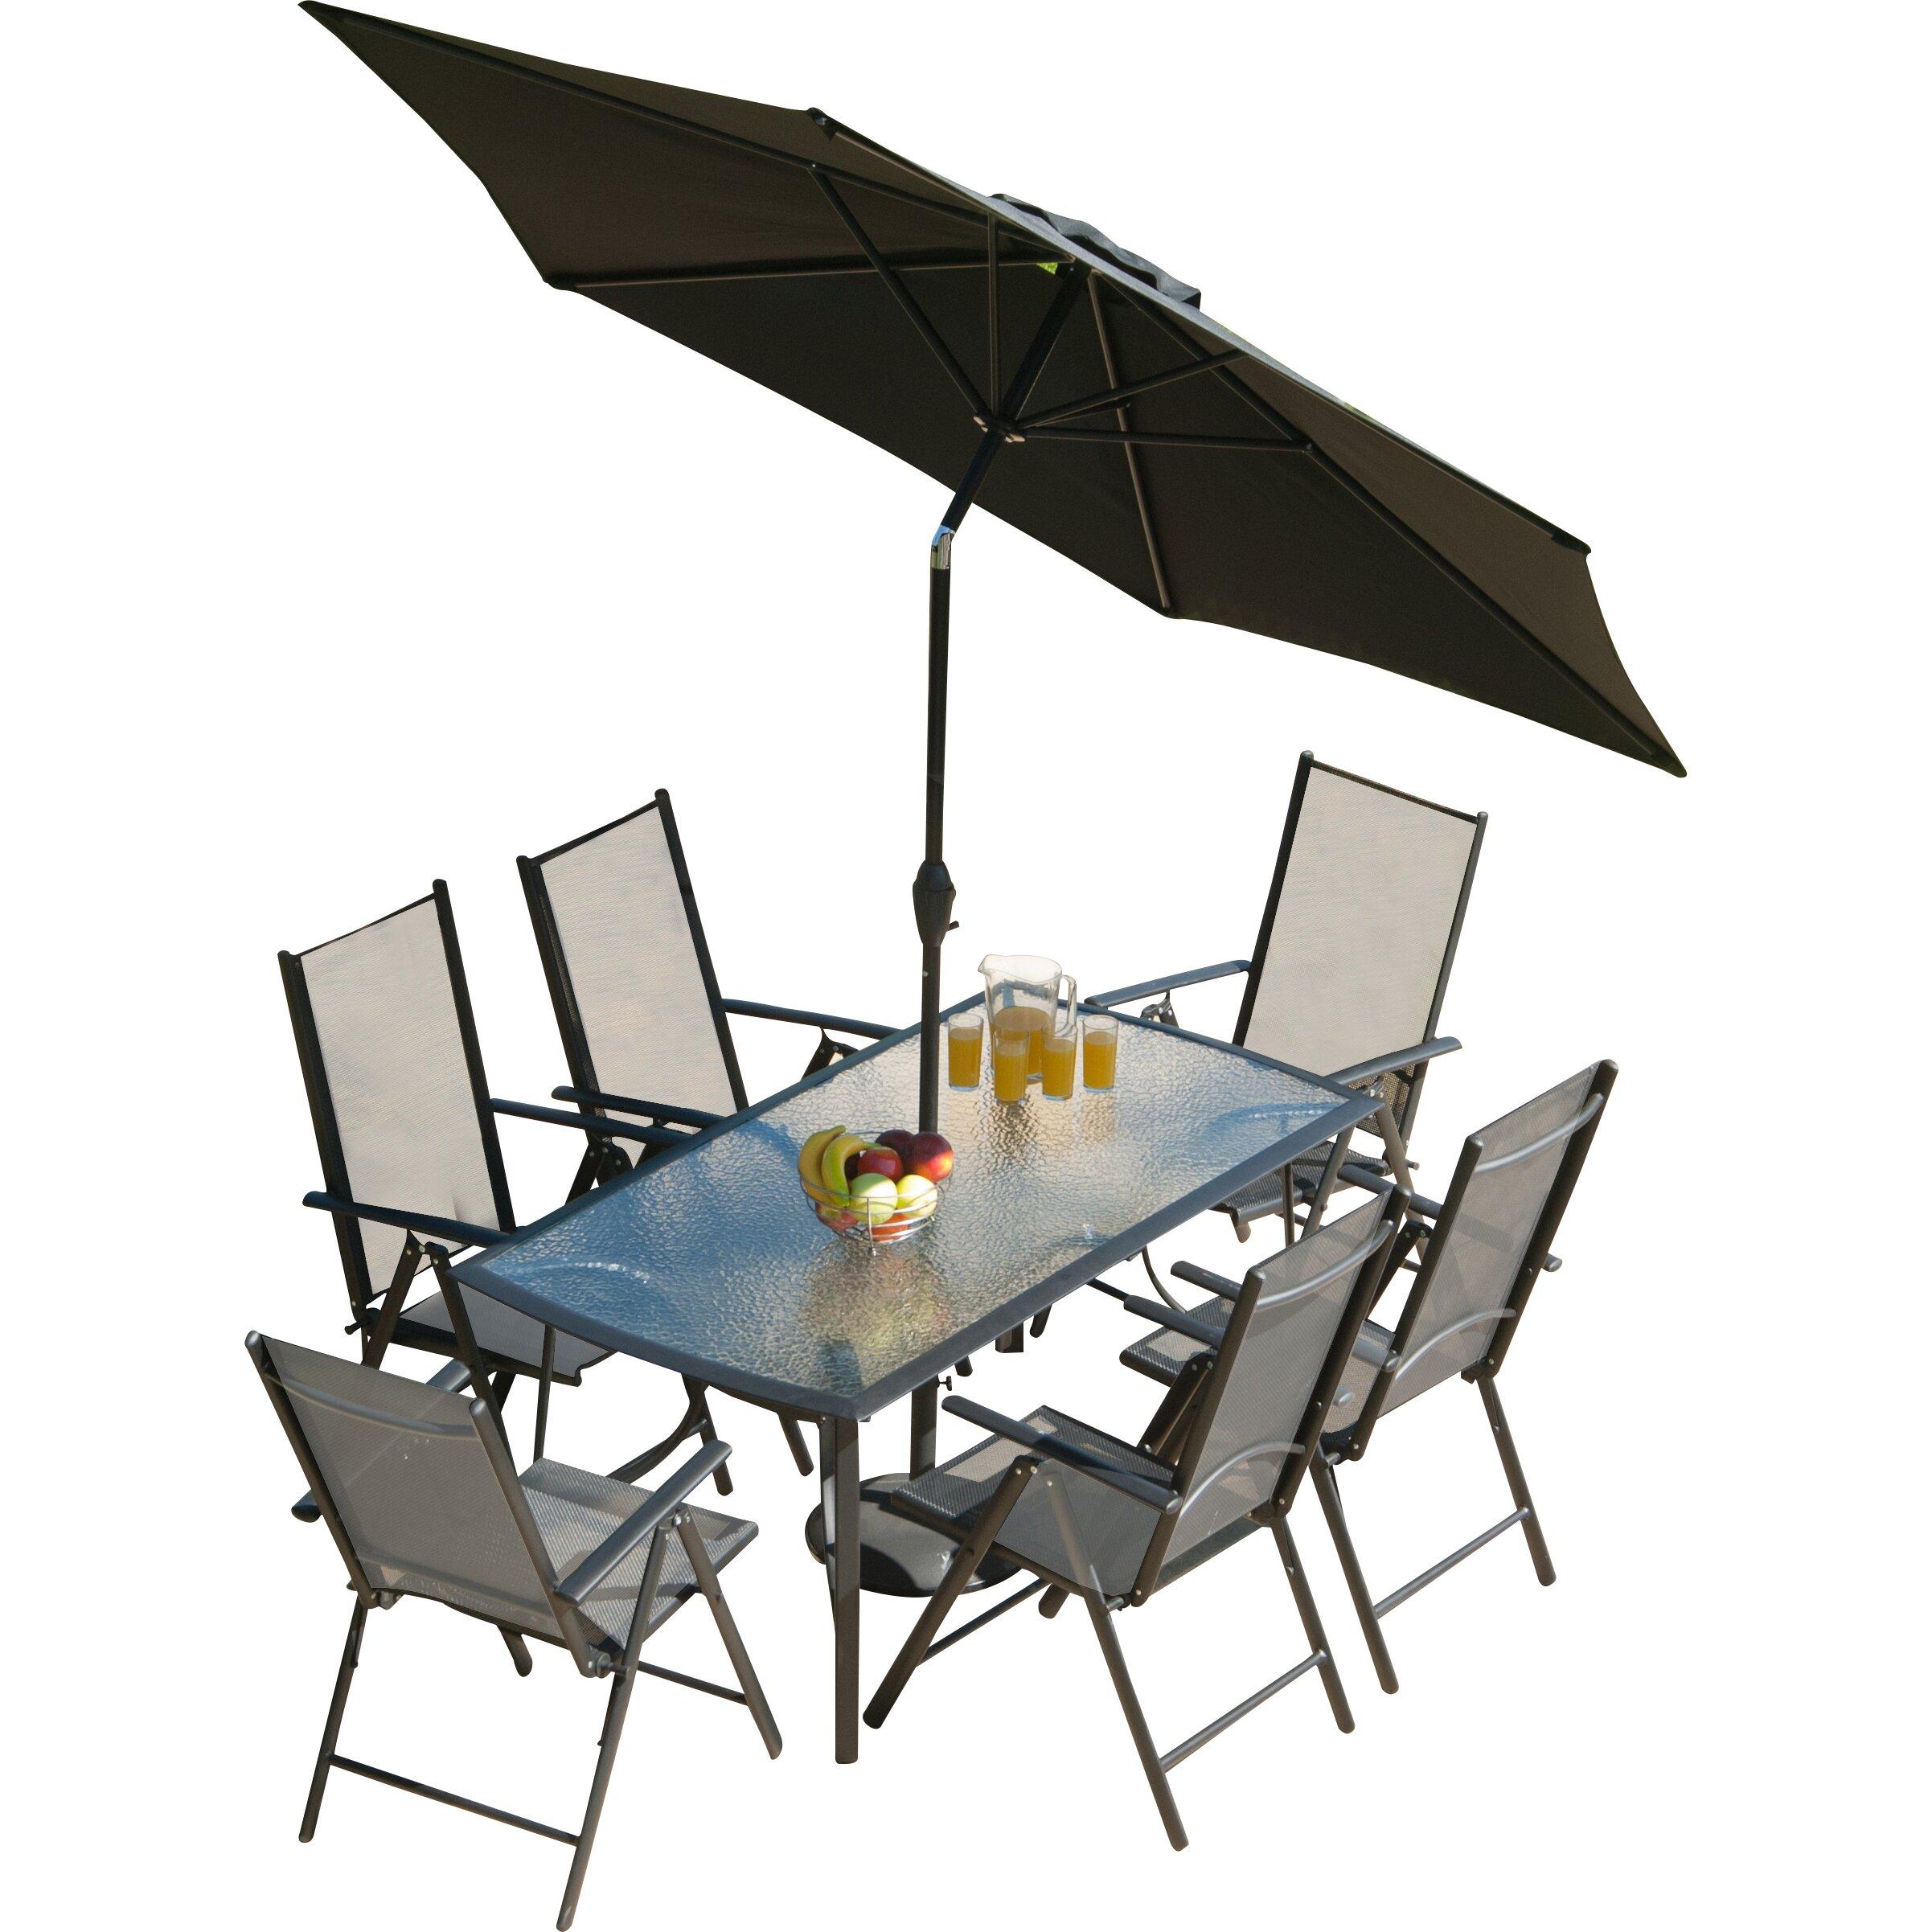 SunTime Outdoor Living Capri 8 Piece Dining Set & Reviews ... on Suntime Outdoor Living id=62361